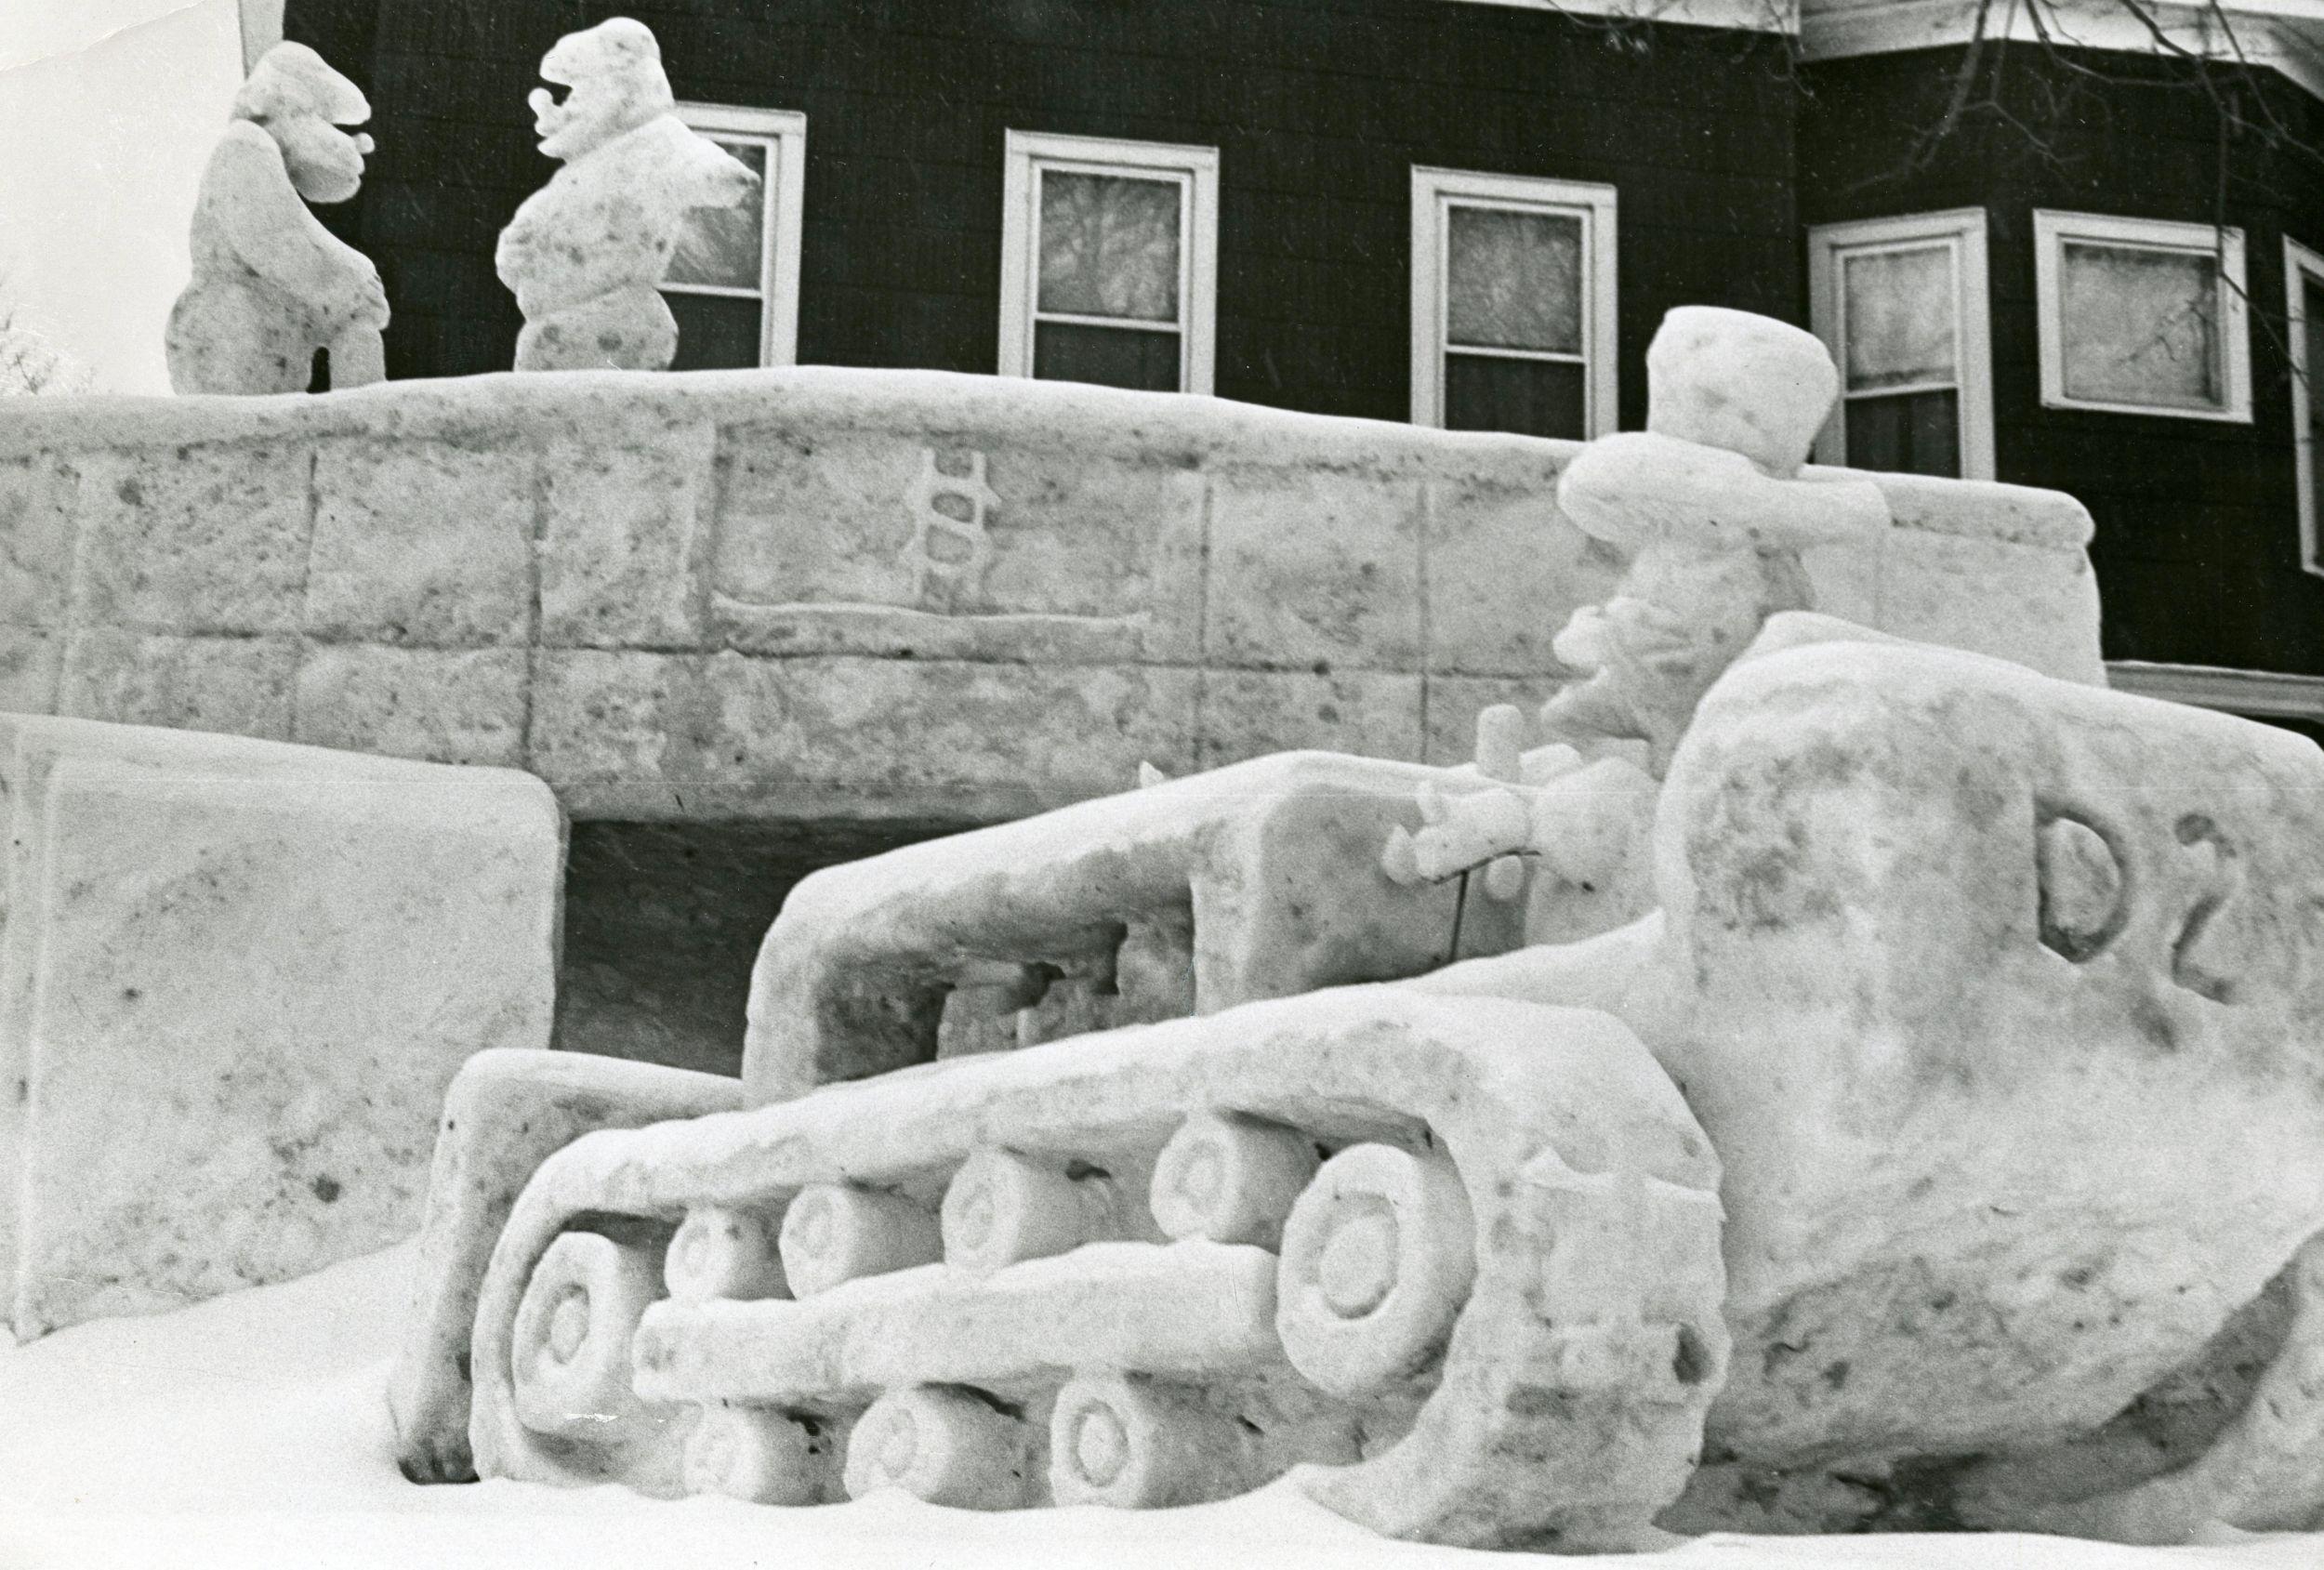 Caterpillar D2 Track-Type Tractor Snow Sculpture,